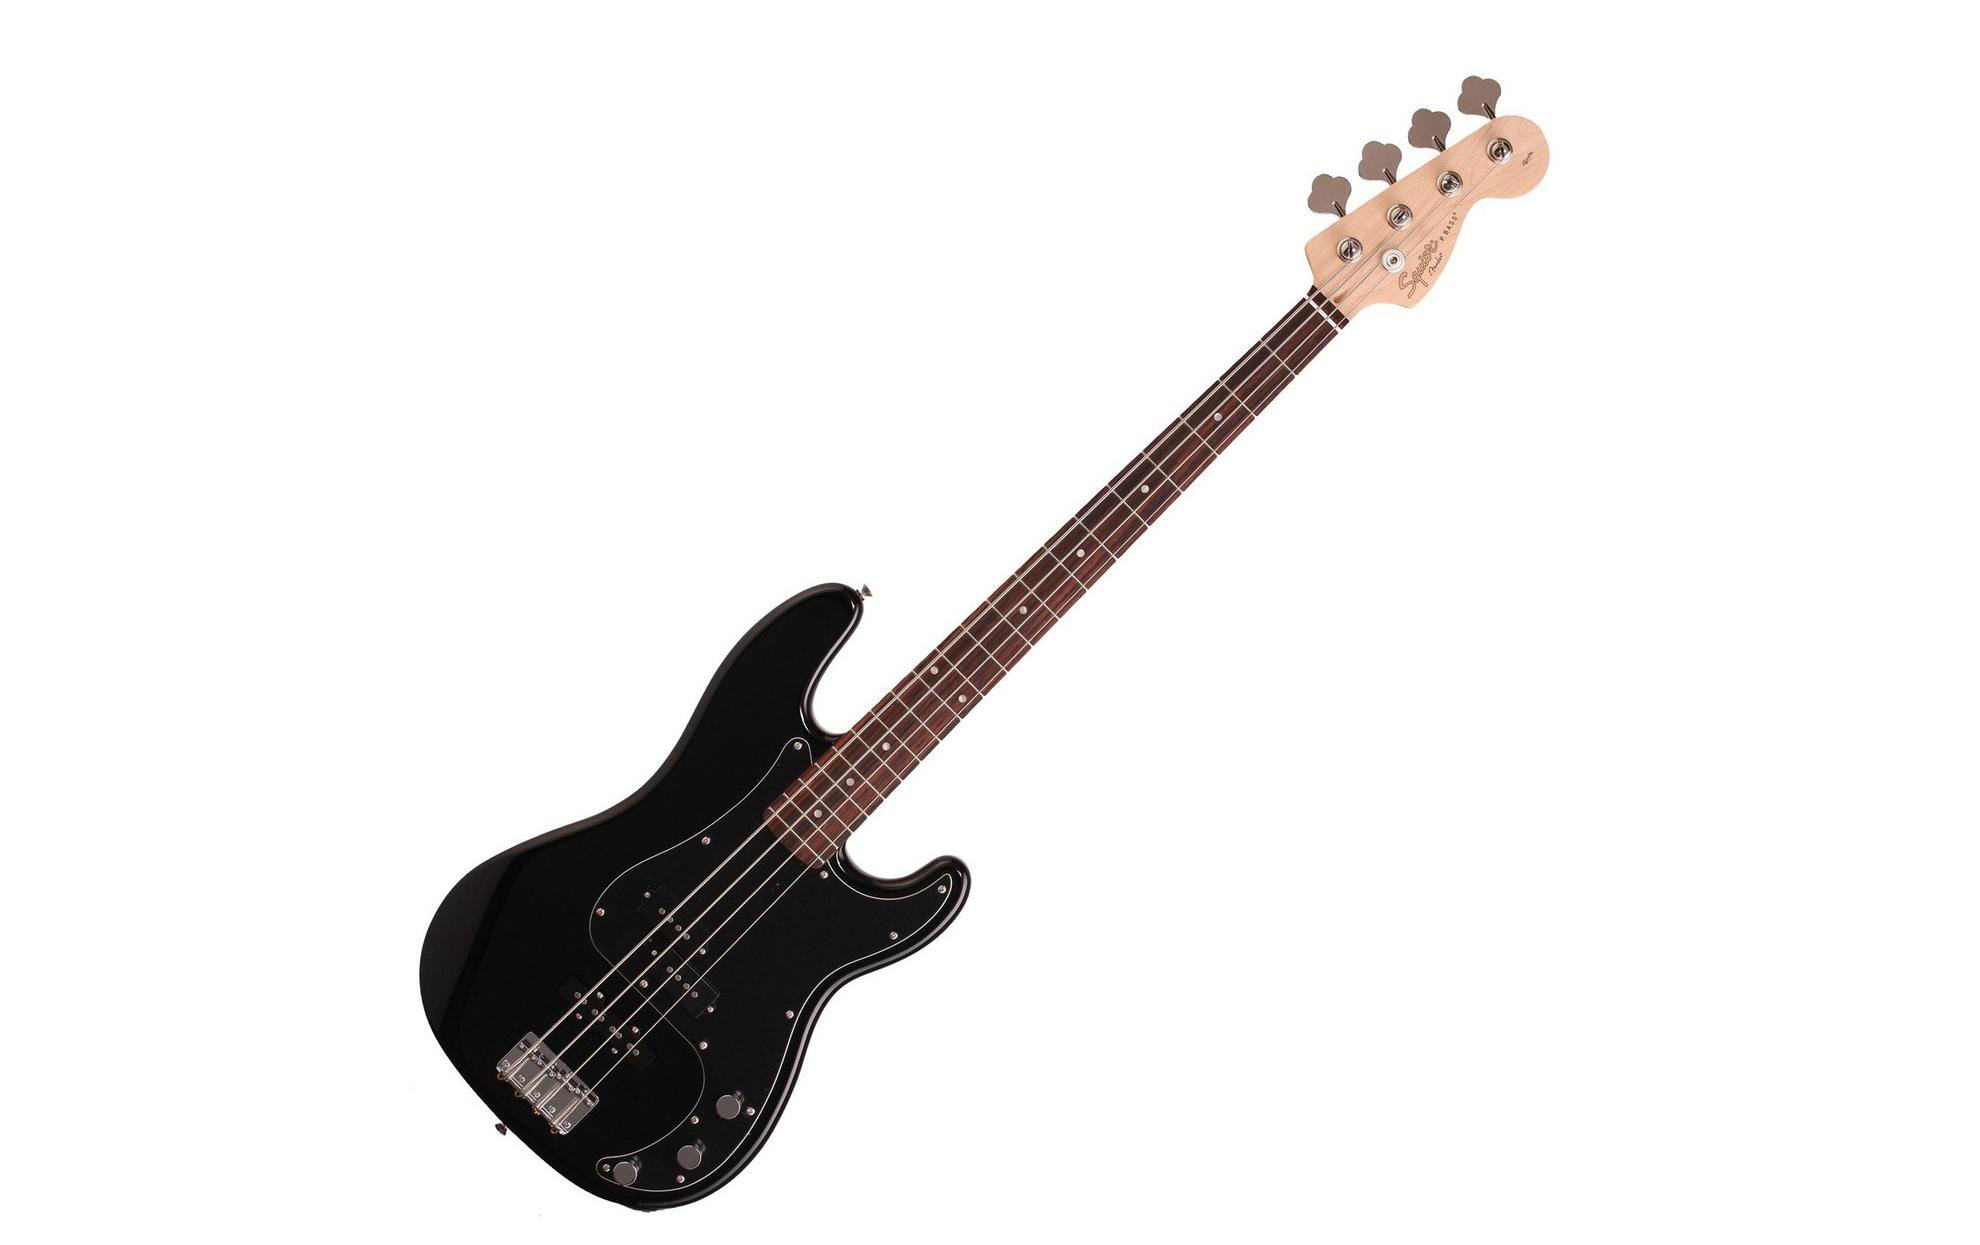 Squier Affinity Precision Jazz in black